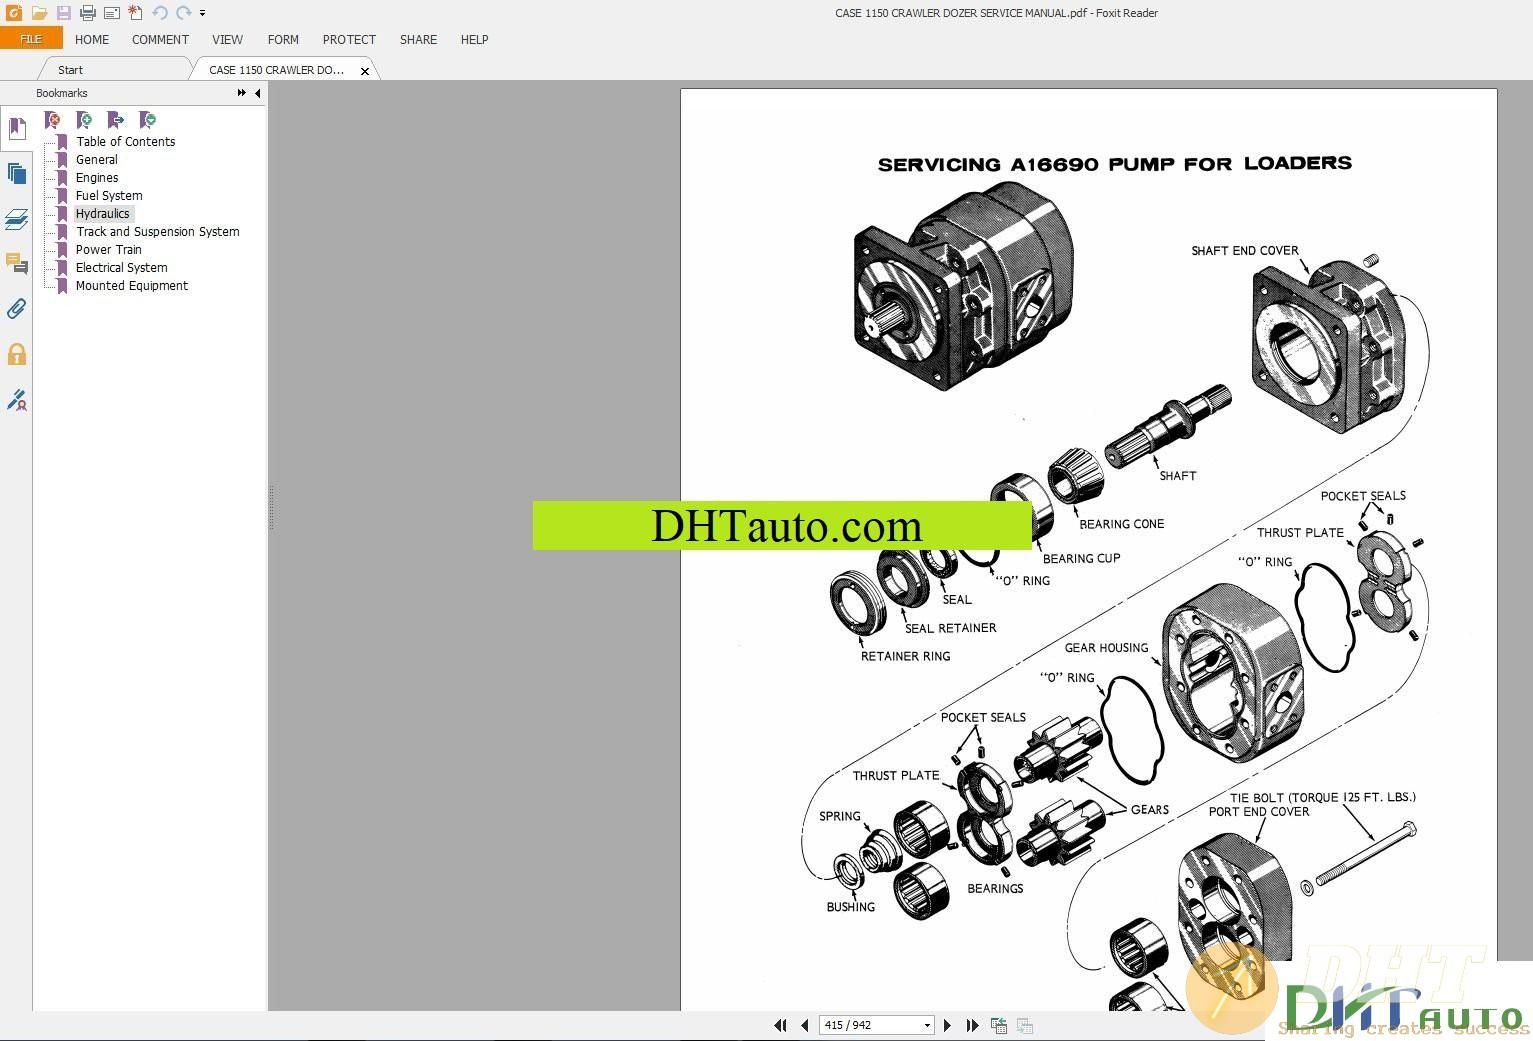 Case Crawler Dozer Operators & Service Manual 4.jpg